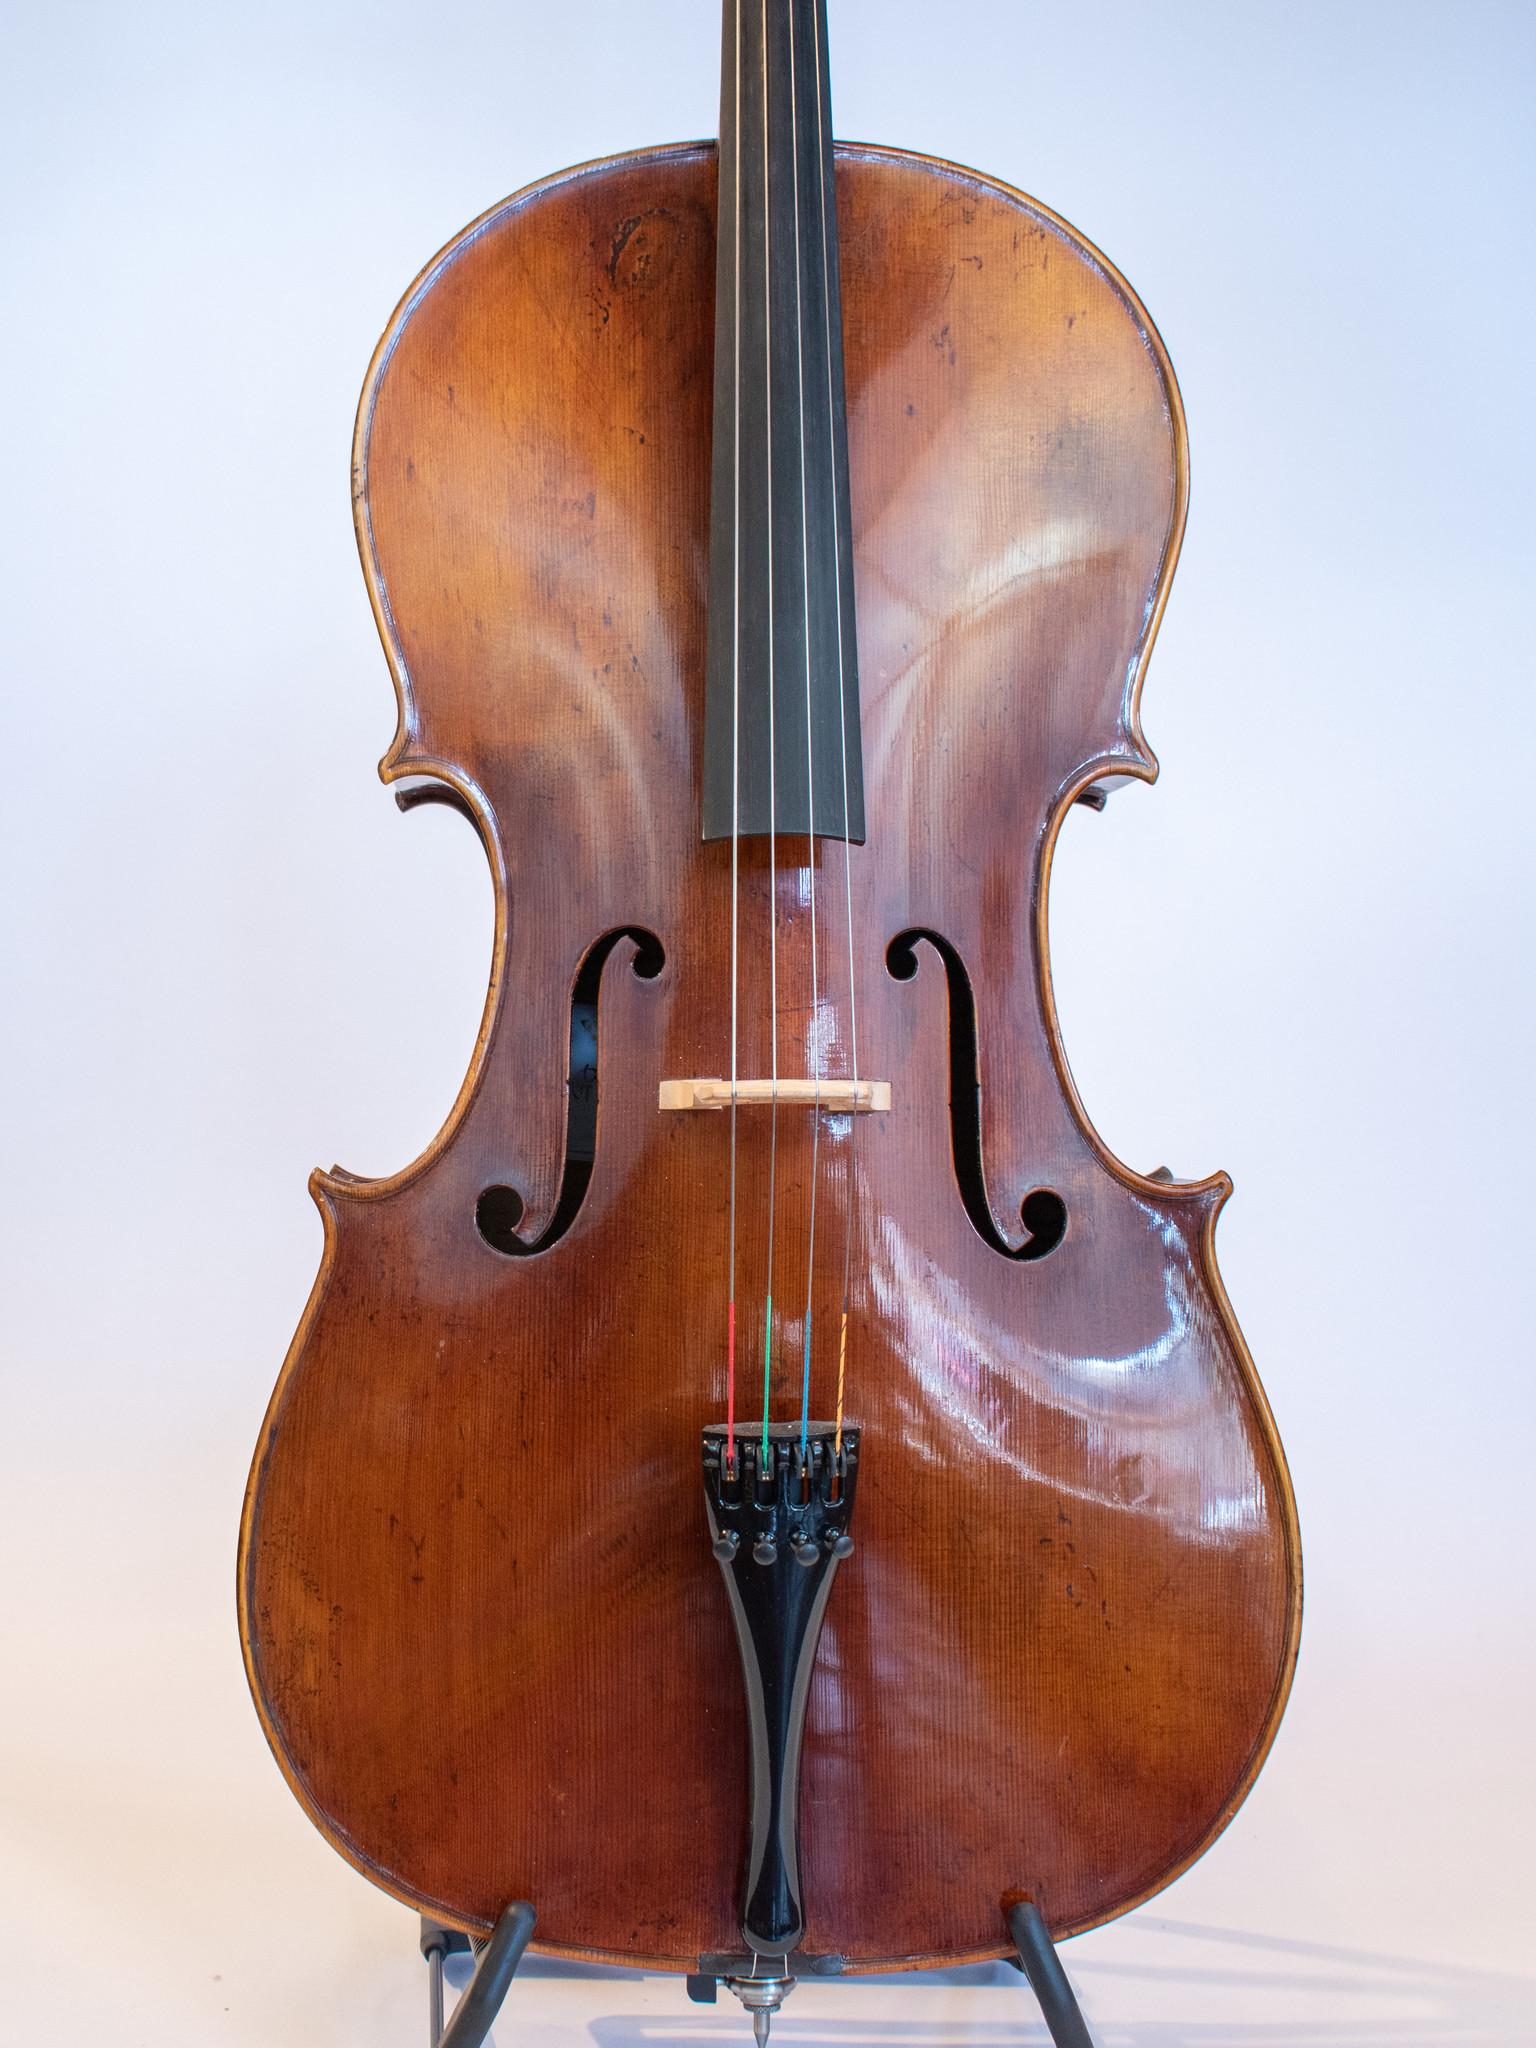 Hungarian Akos Balazs Gold cello, 2018, Budapest, Hungary